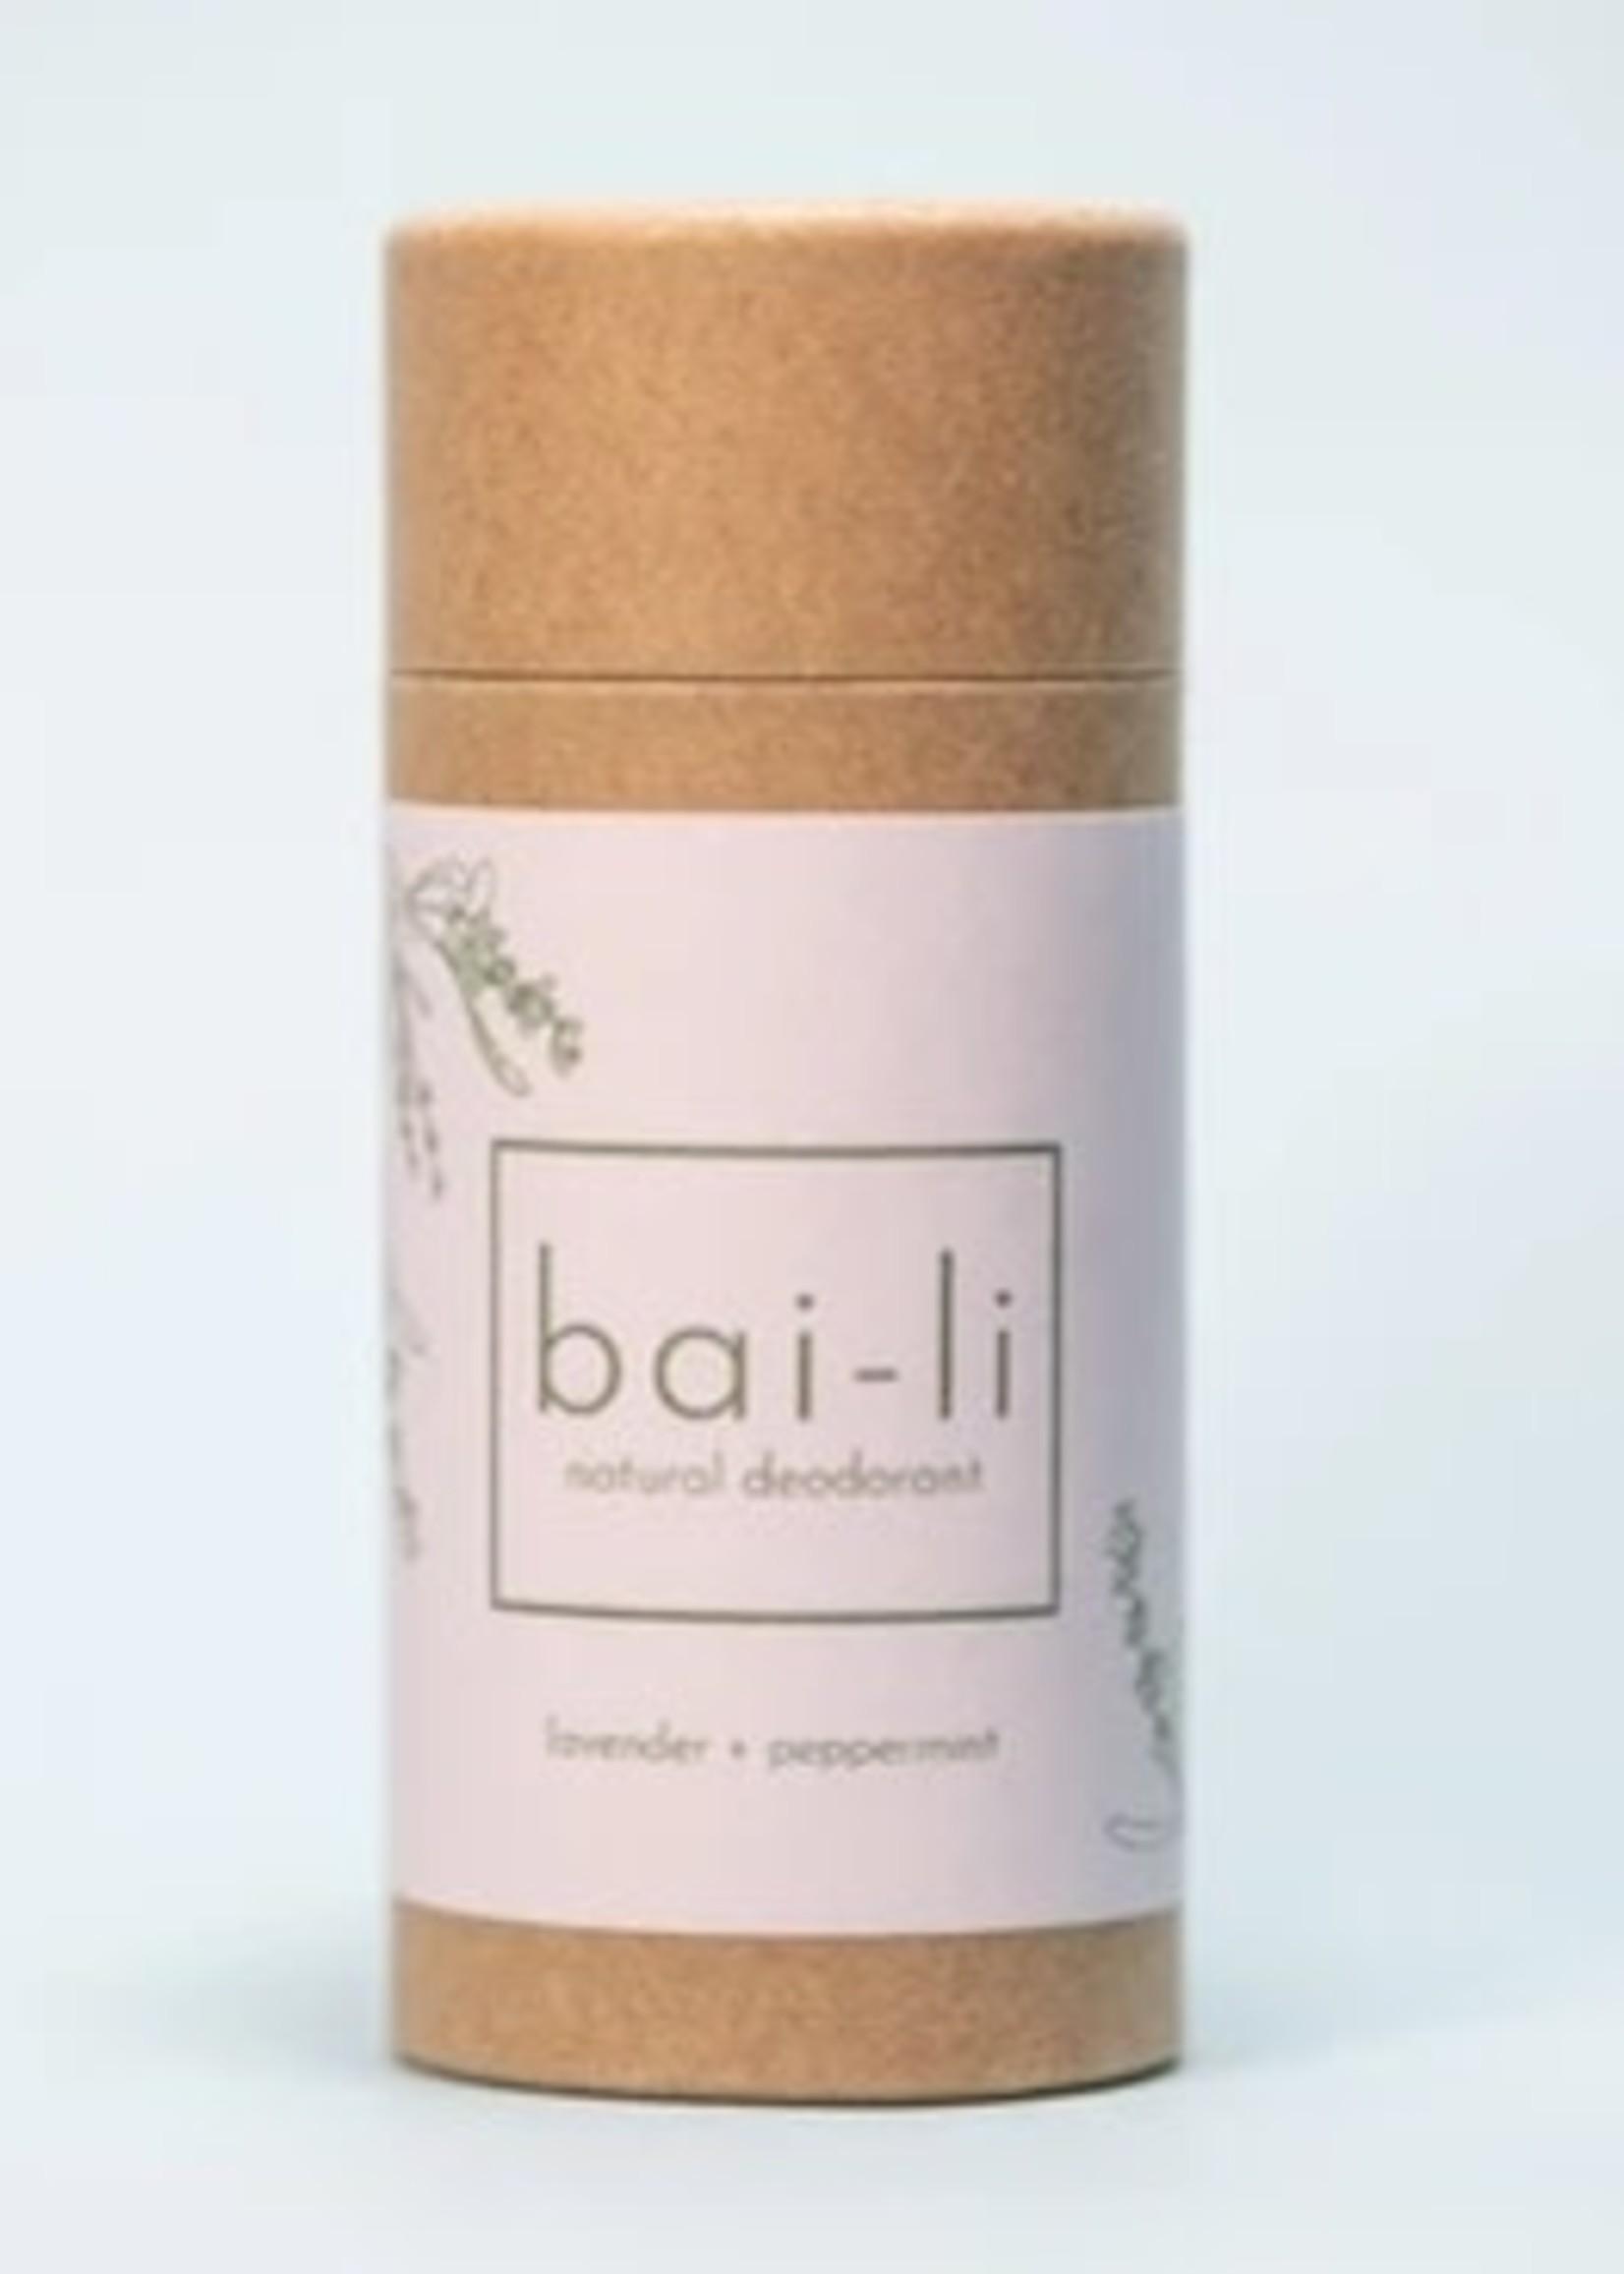 Bai-li Lavender Peppermint Deodorant